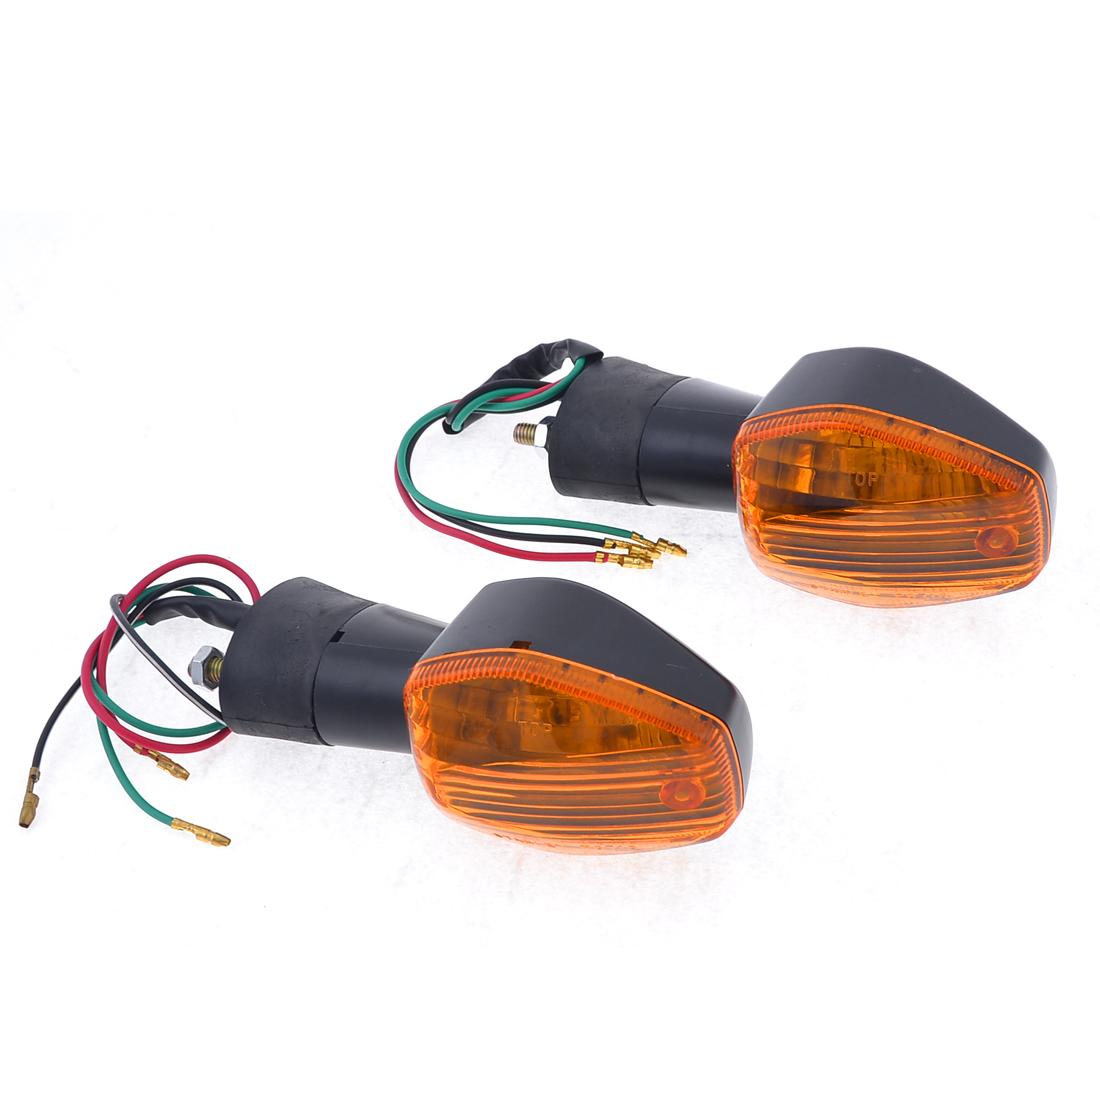 2 Pcs Black Plastic Motorcycle Yellow Turn Light Signal Lamps for Honda CBR600